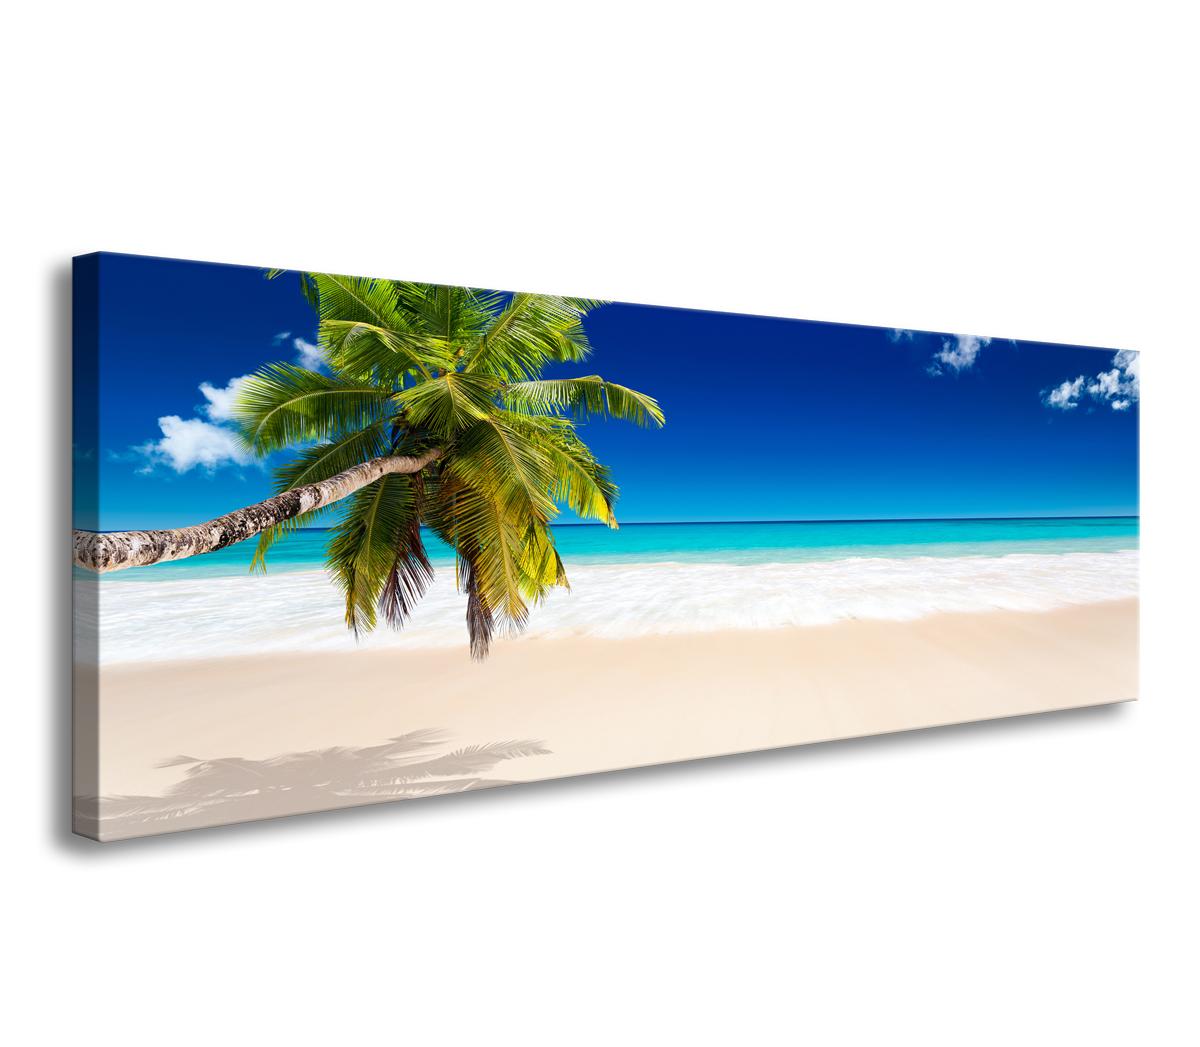 bilder 120 x 40 cm viele motive aufh ngfertige leinwand wandbilder 1578 picsmix ebay. Black Bedroom Furniture Sets. Home Design Ideas